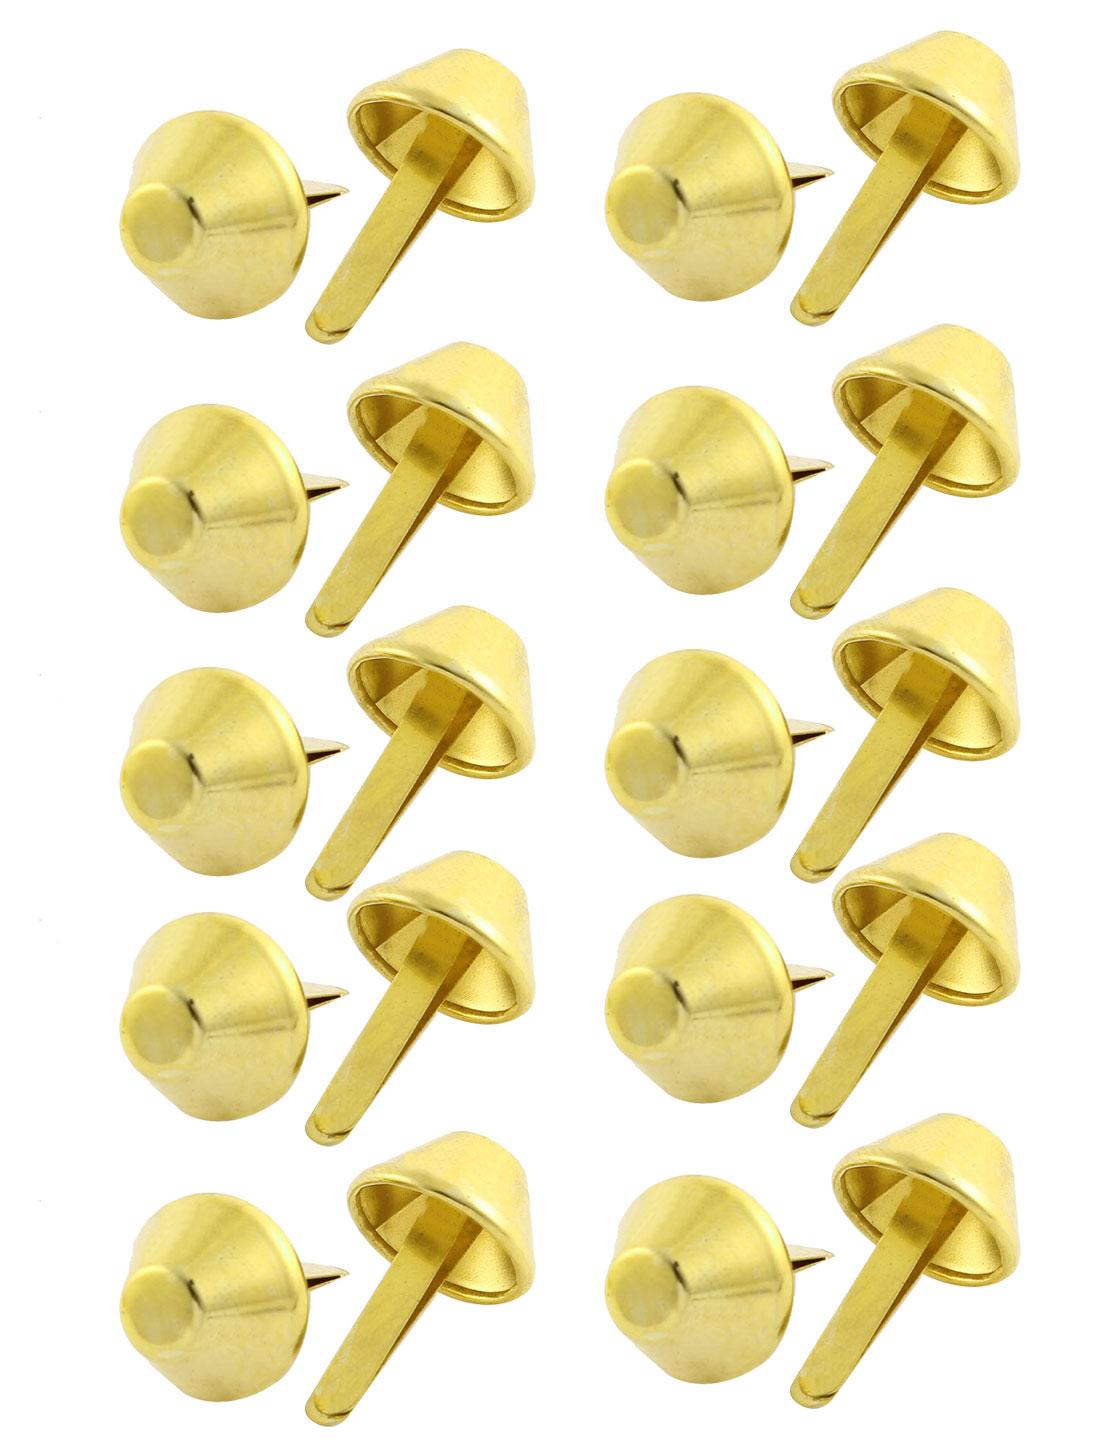 15mm Dia Lamp Shape Clothes Decorative Metal Split Rivets Gold Tone 20Pcs